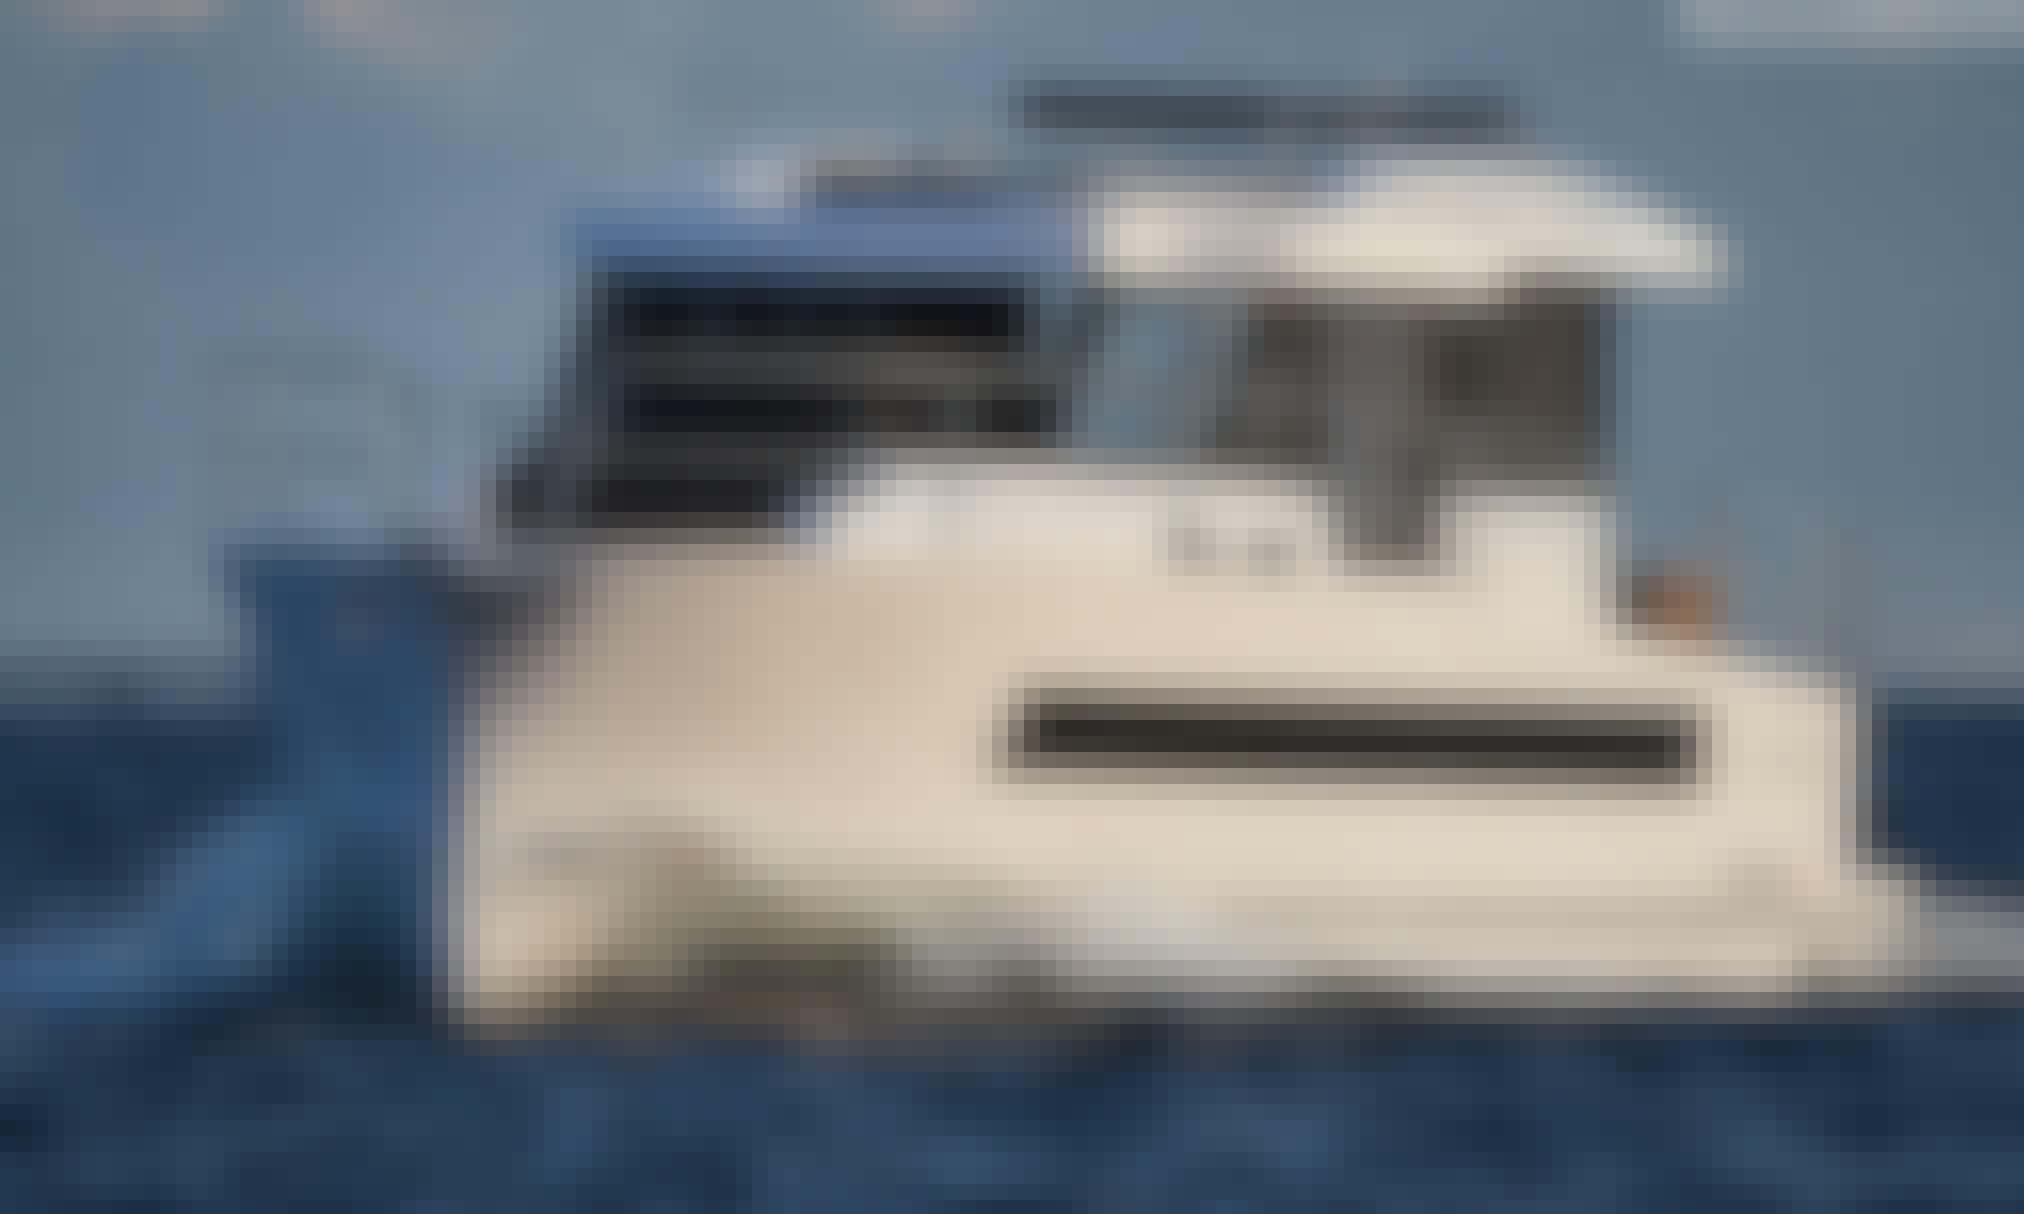 Motor Yacht Northman 1200 Elegance rental in Wilkasy, Poland